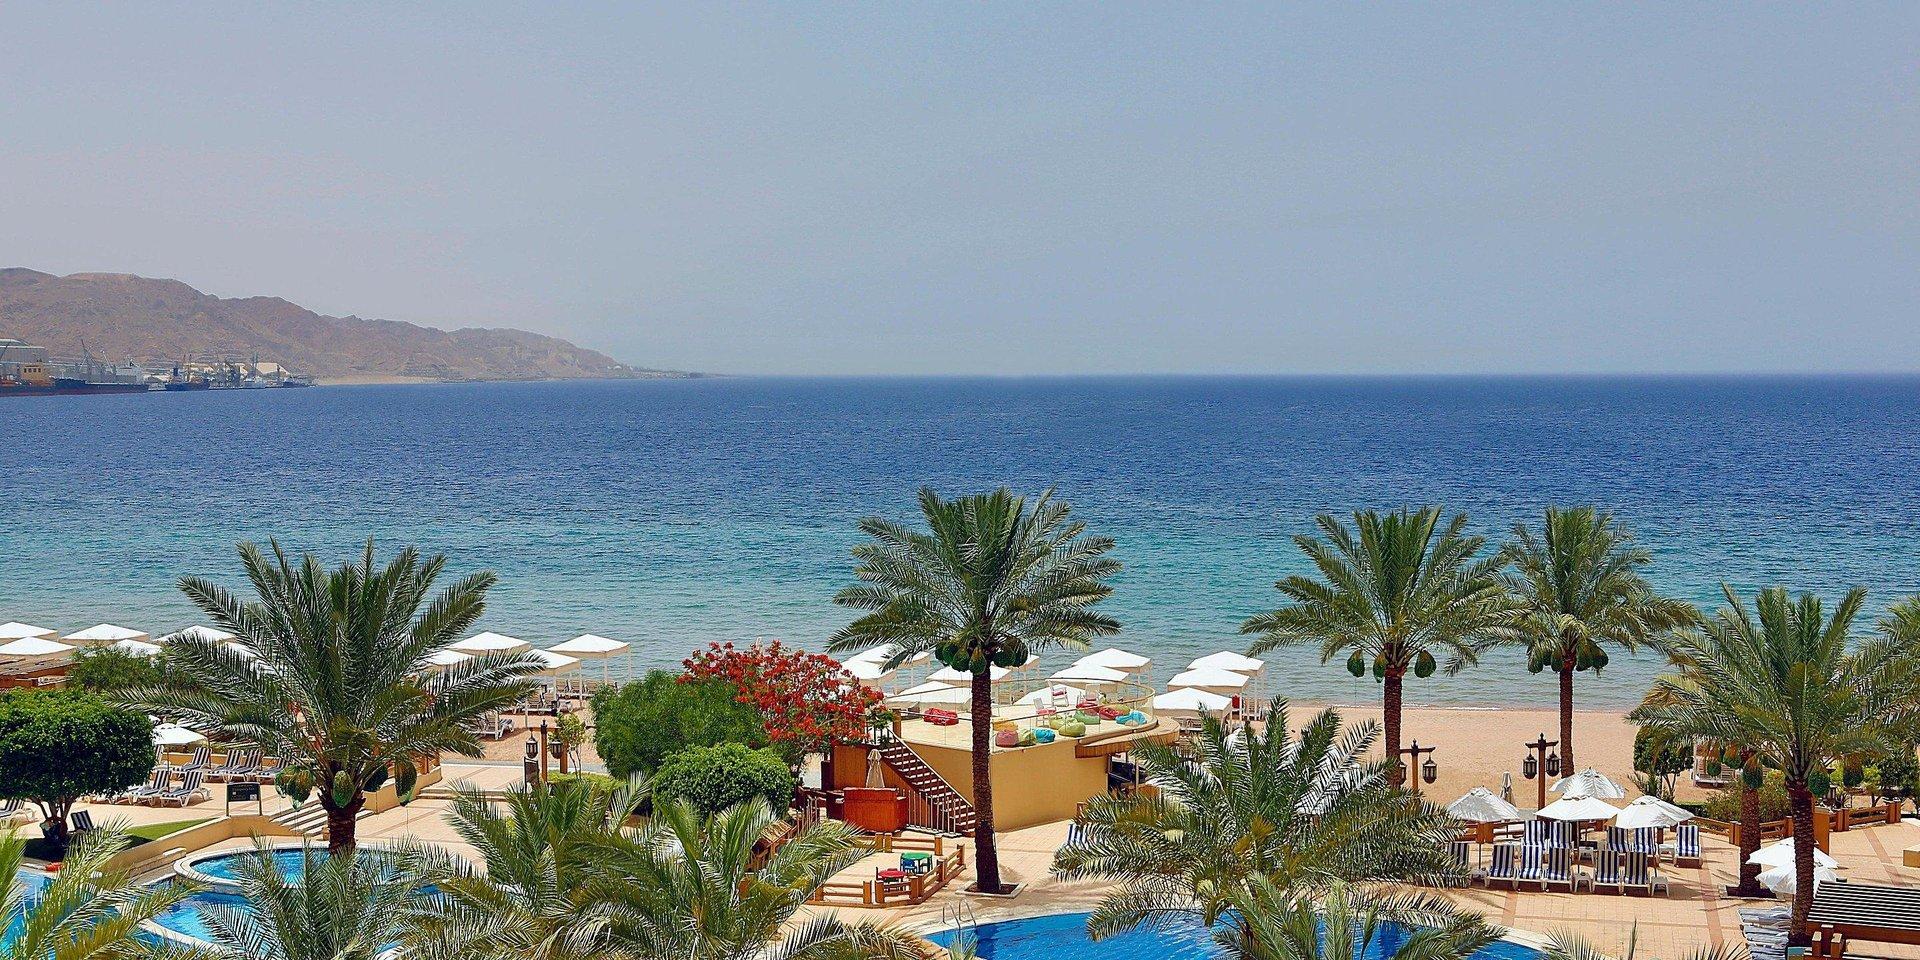 Strand bij hotel Intercontinental Aqaba - Aqaba